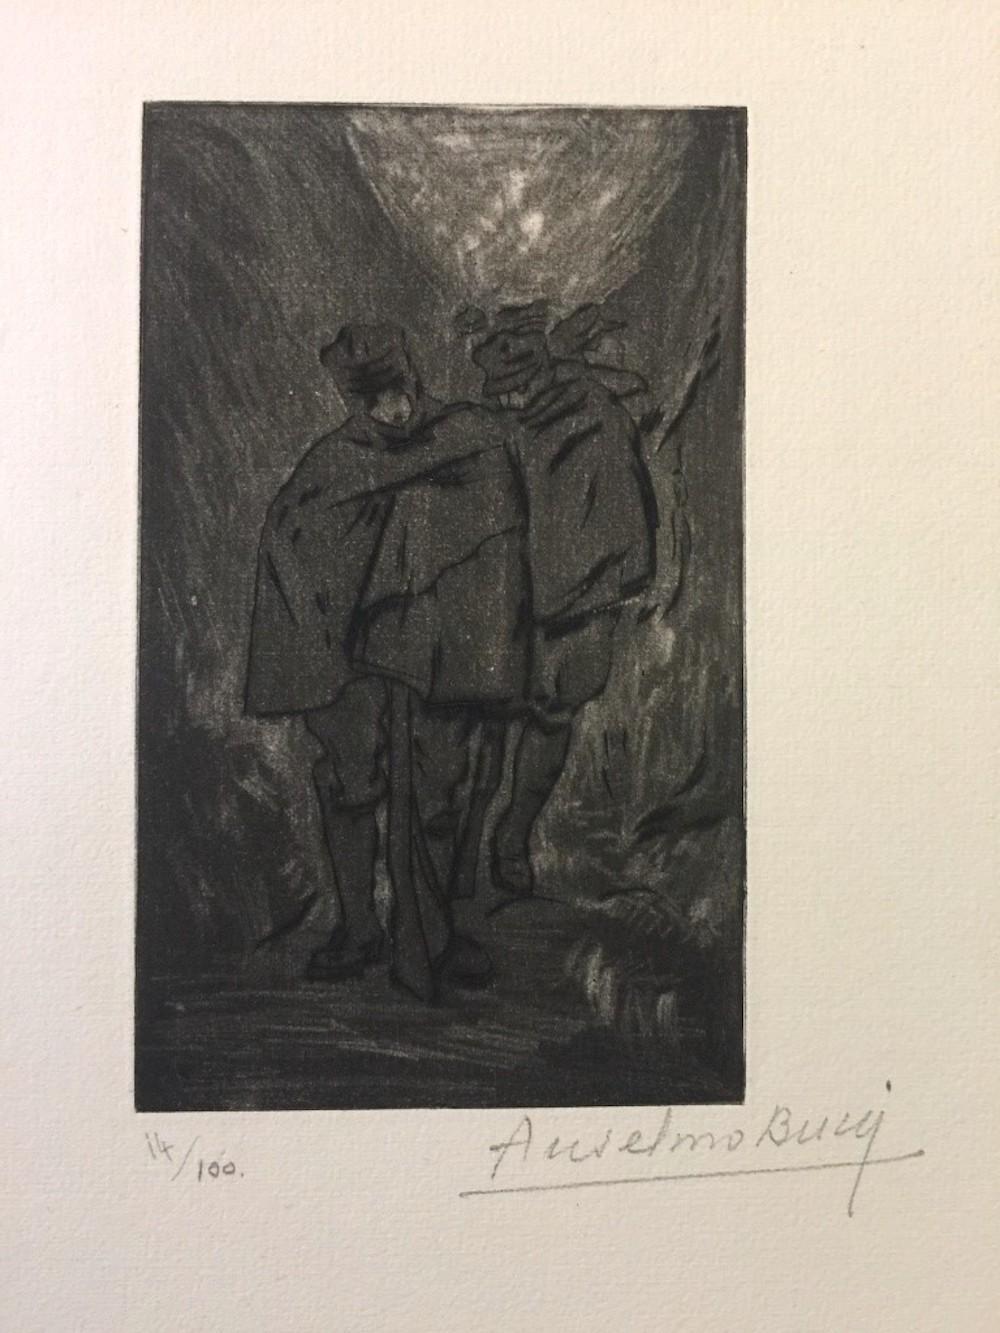 Halte - Original Etching by Anselmo Bucci - 1917